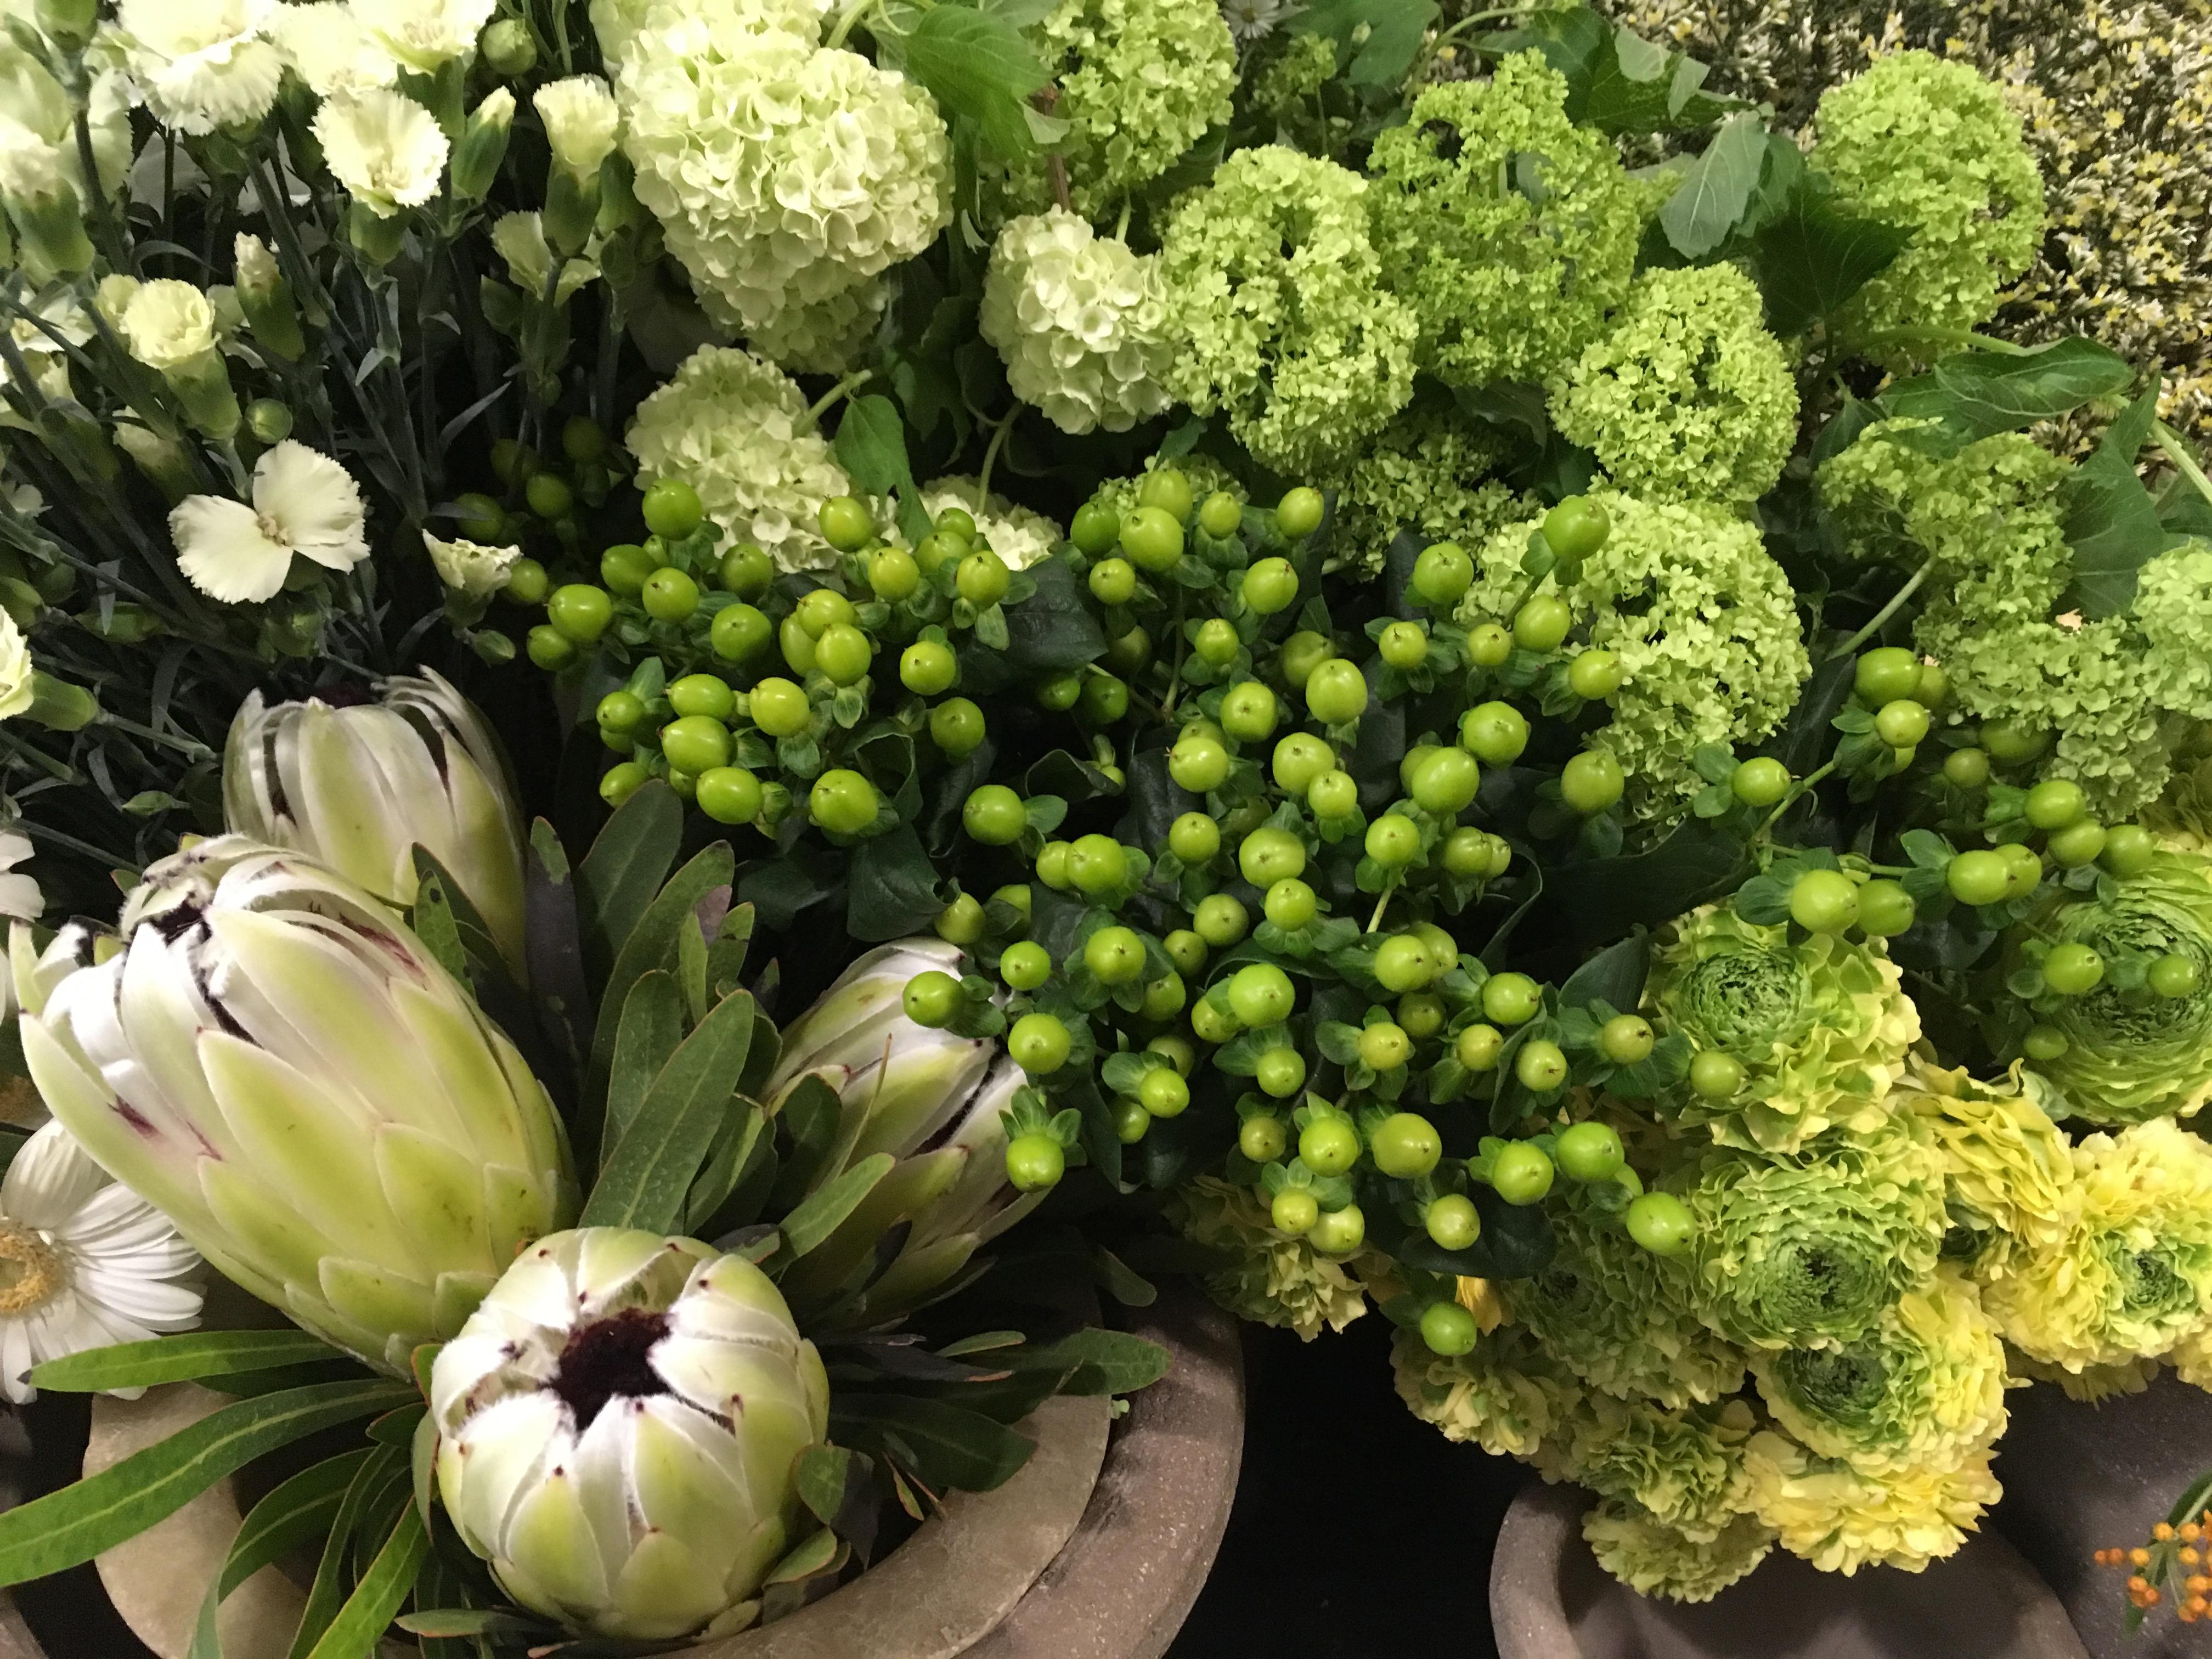 Hypericum protea viburnum Marlies Fleurs fleuriste Nimes